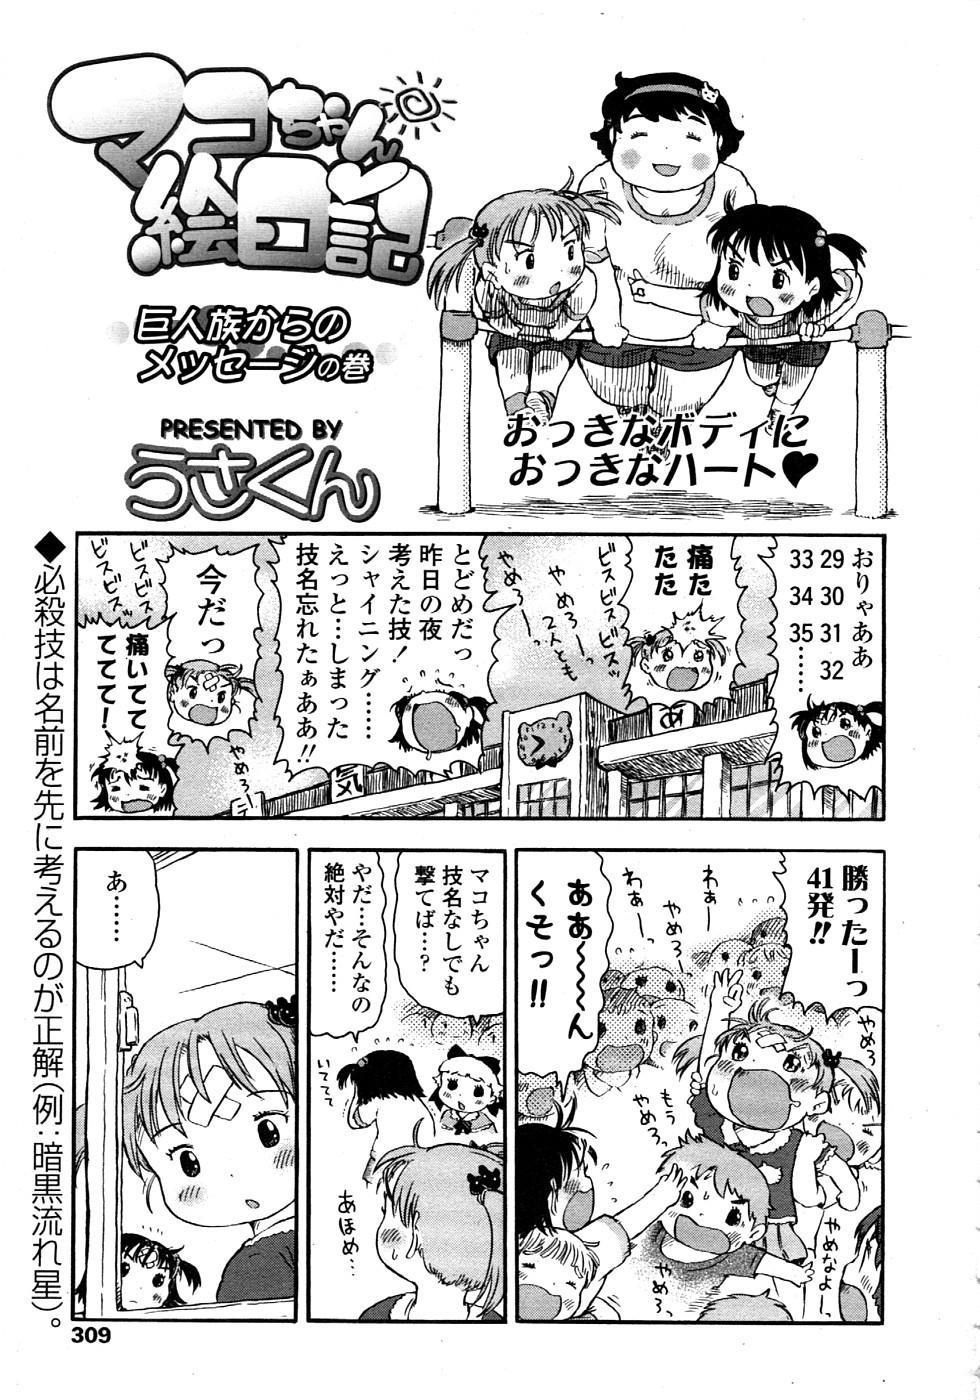 Comic LO 2008-11 Vol. 56 308